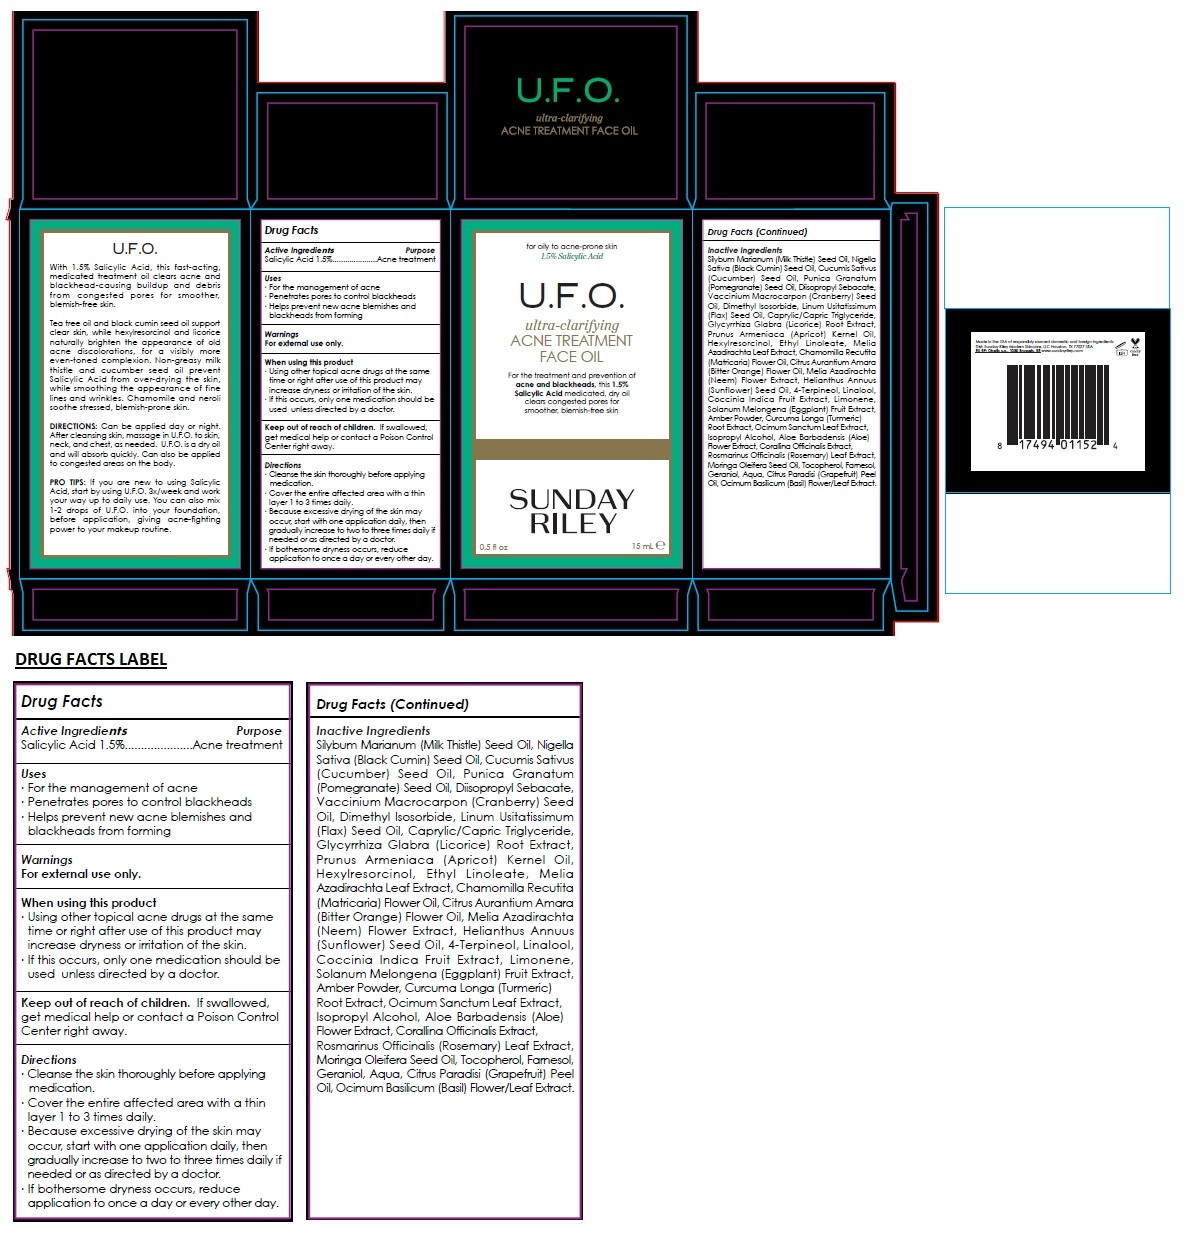 Ufo-nw